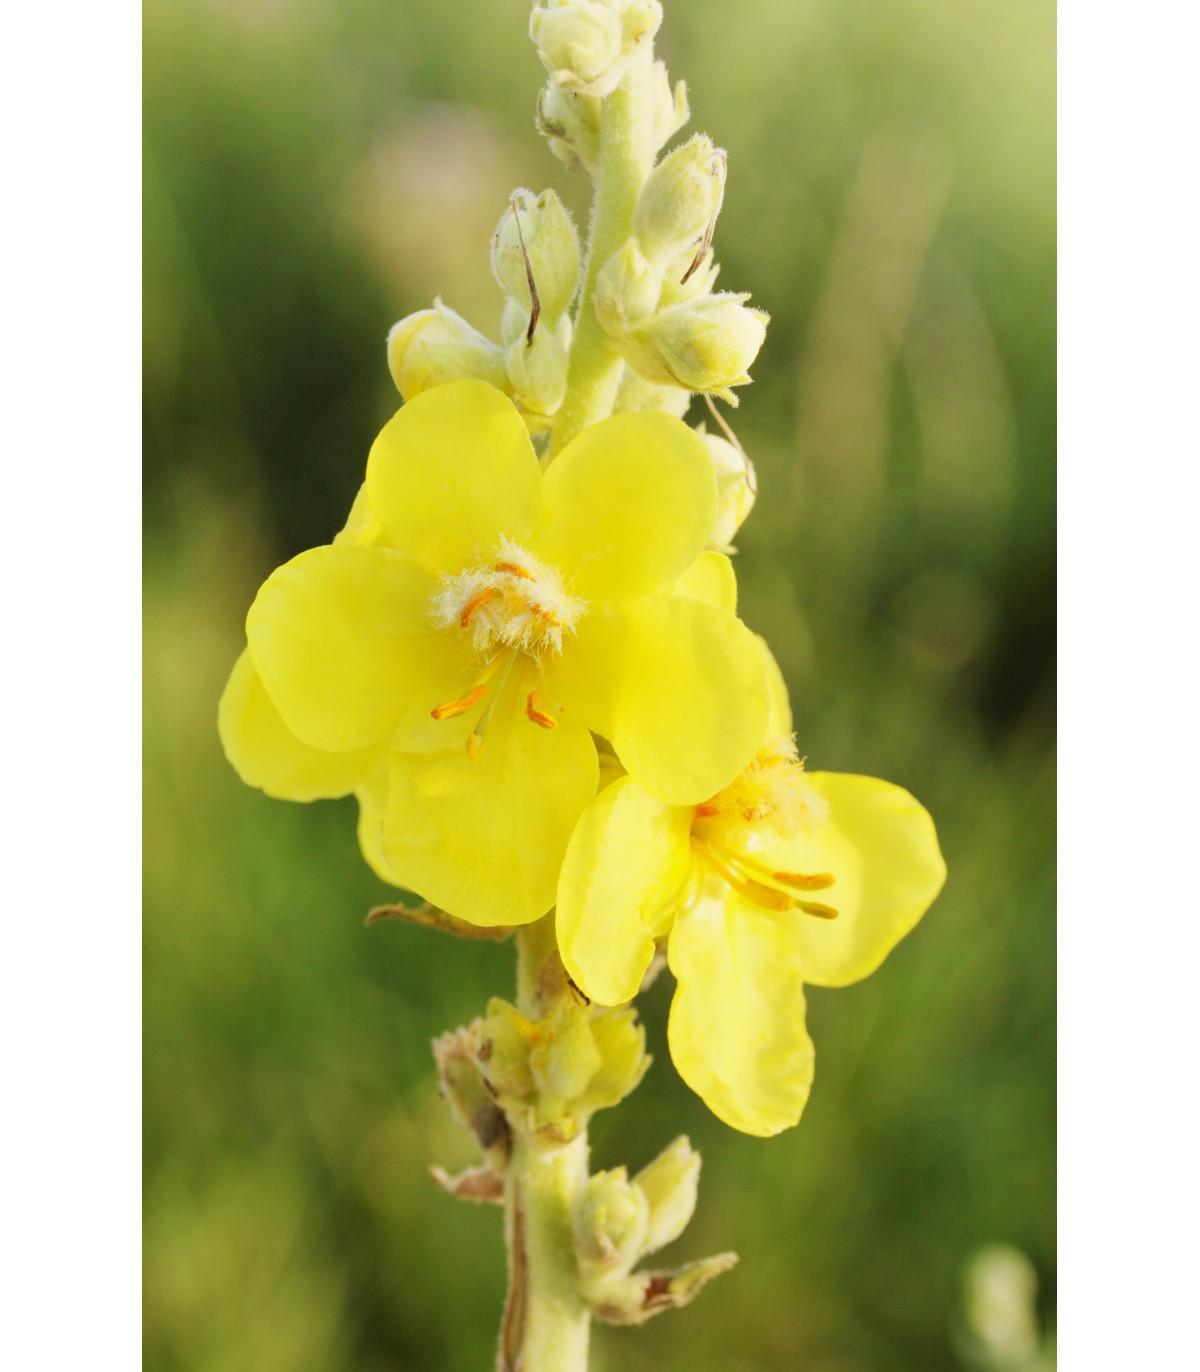 Divozel veľkokvetý - Verbascum densiflorum - semená divozelu - 300 ks